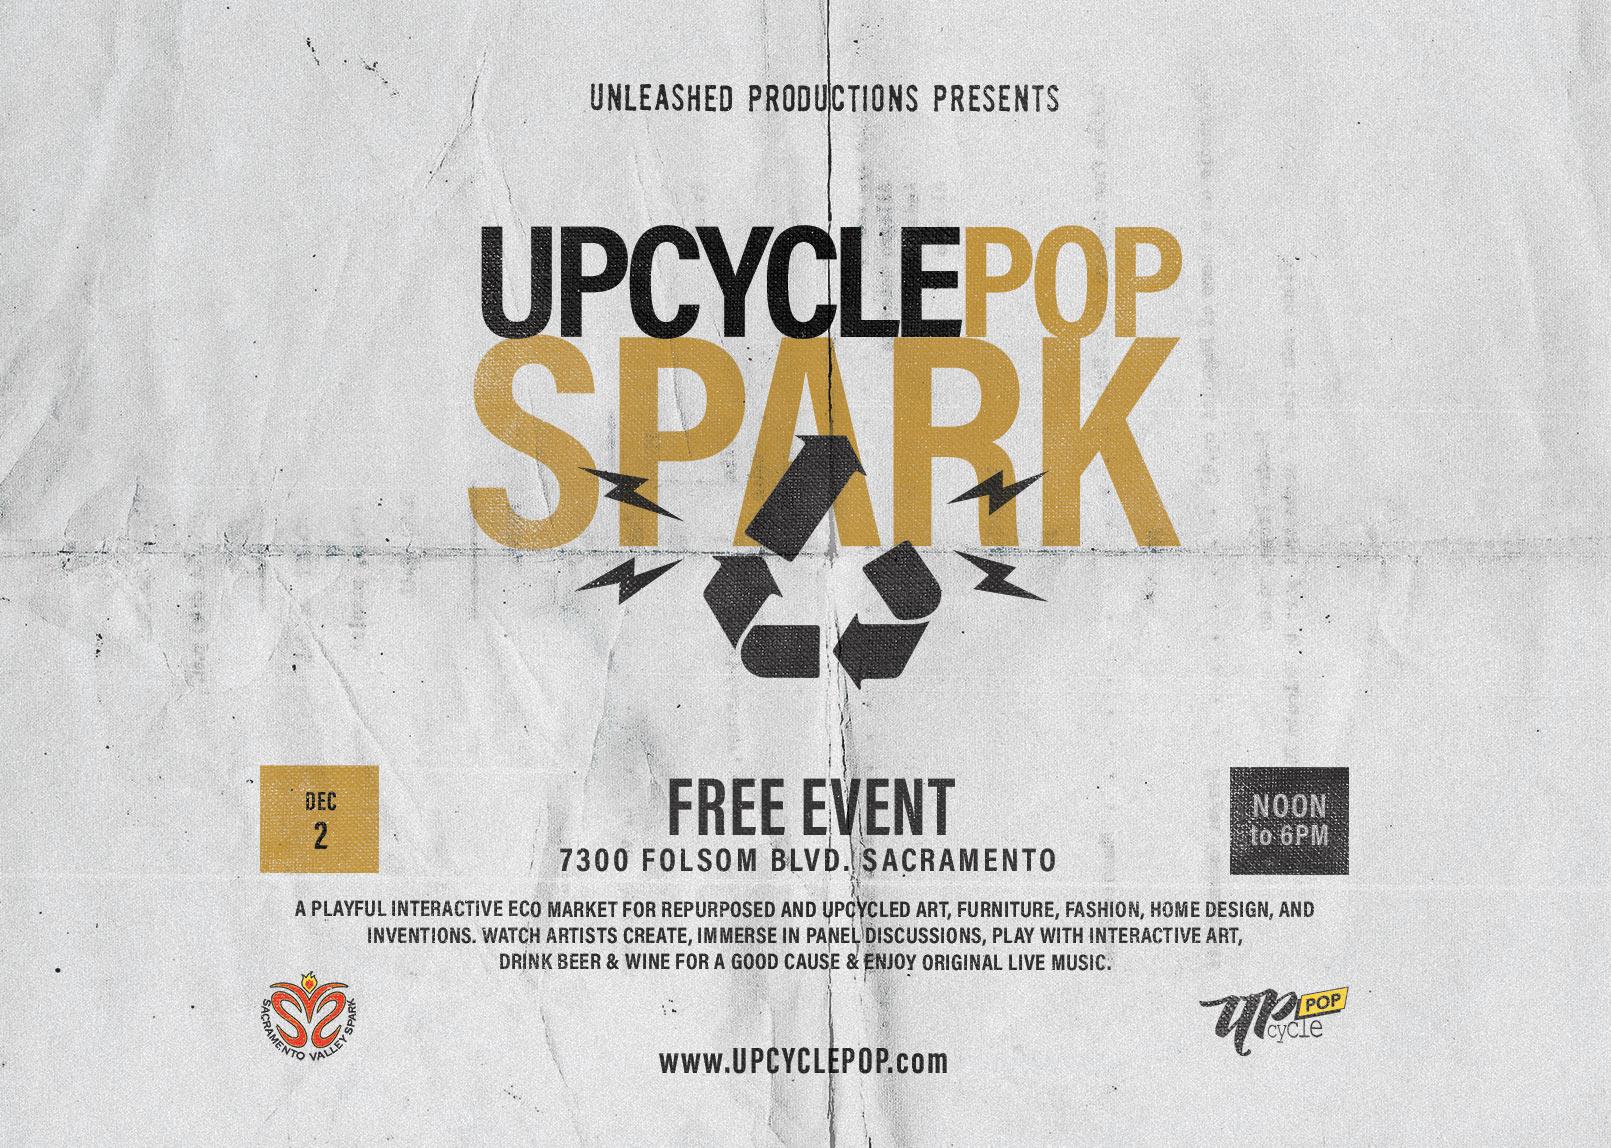 20181202 Upcyclepop spark 11 by 8 horizontal